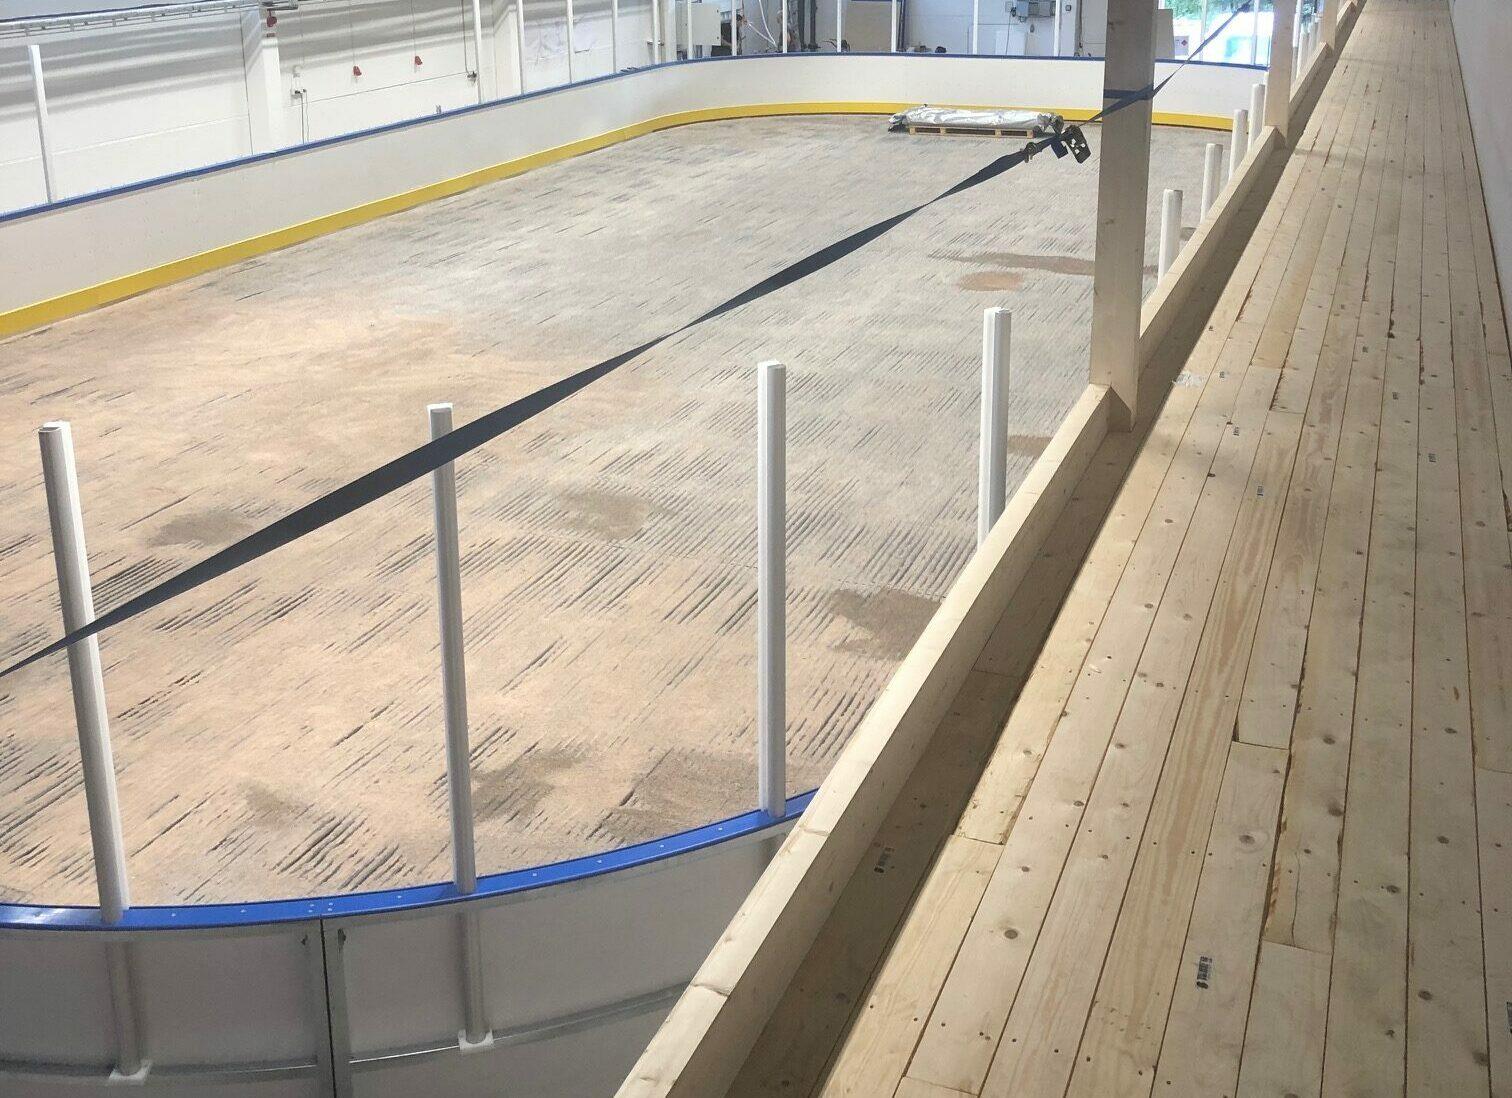 Contractor Sundsvall hjälper slipade proffs